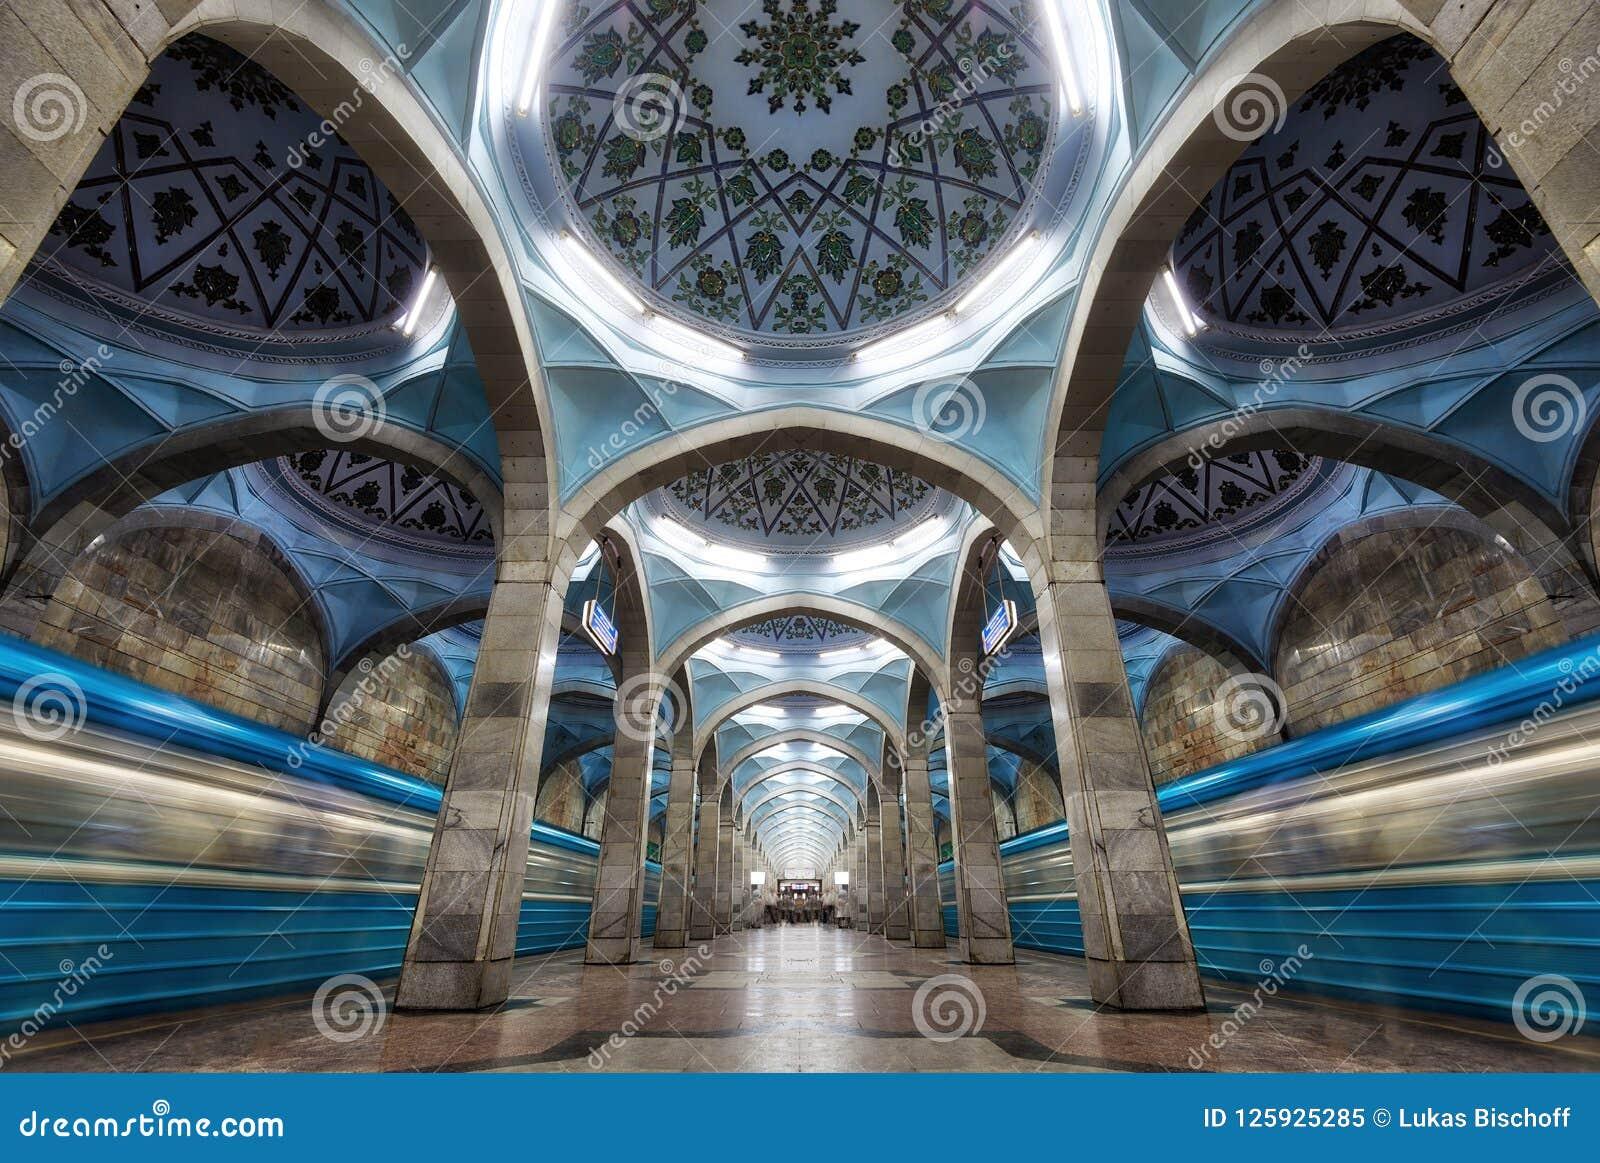 Symmetrische Metro-Stations-Architektur in zentralem Taschkent, Uzbeki